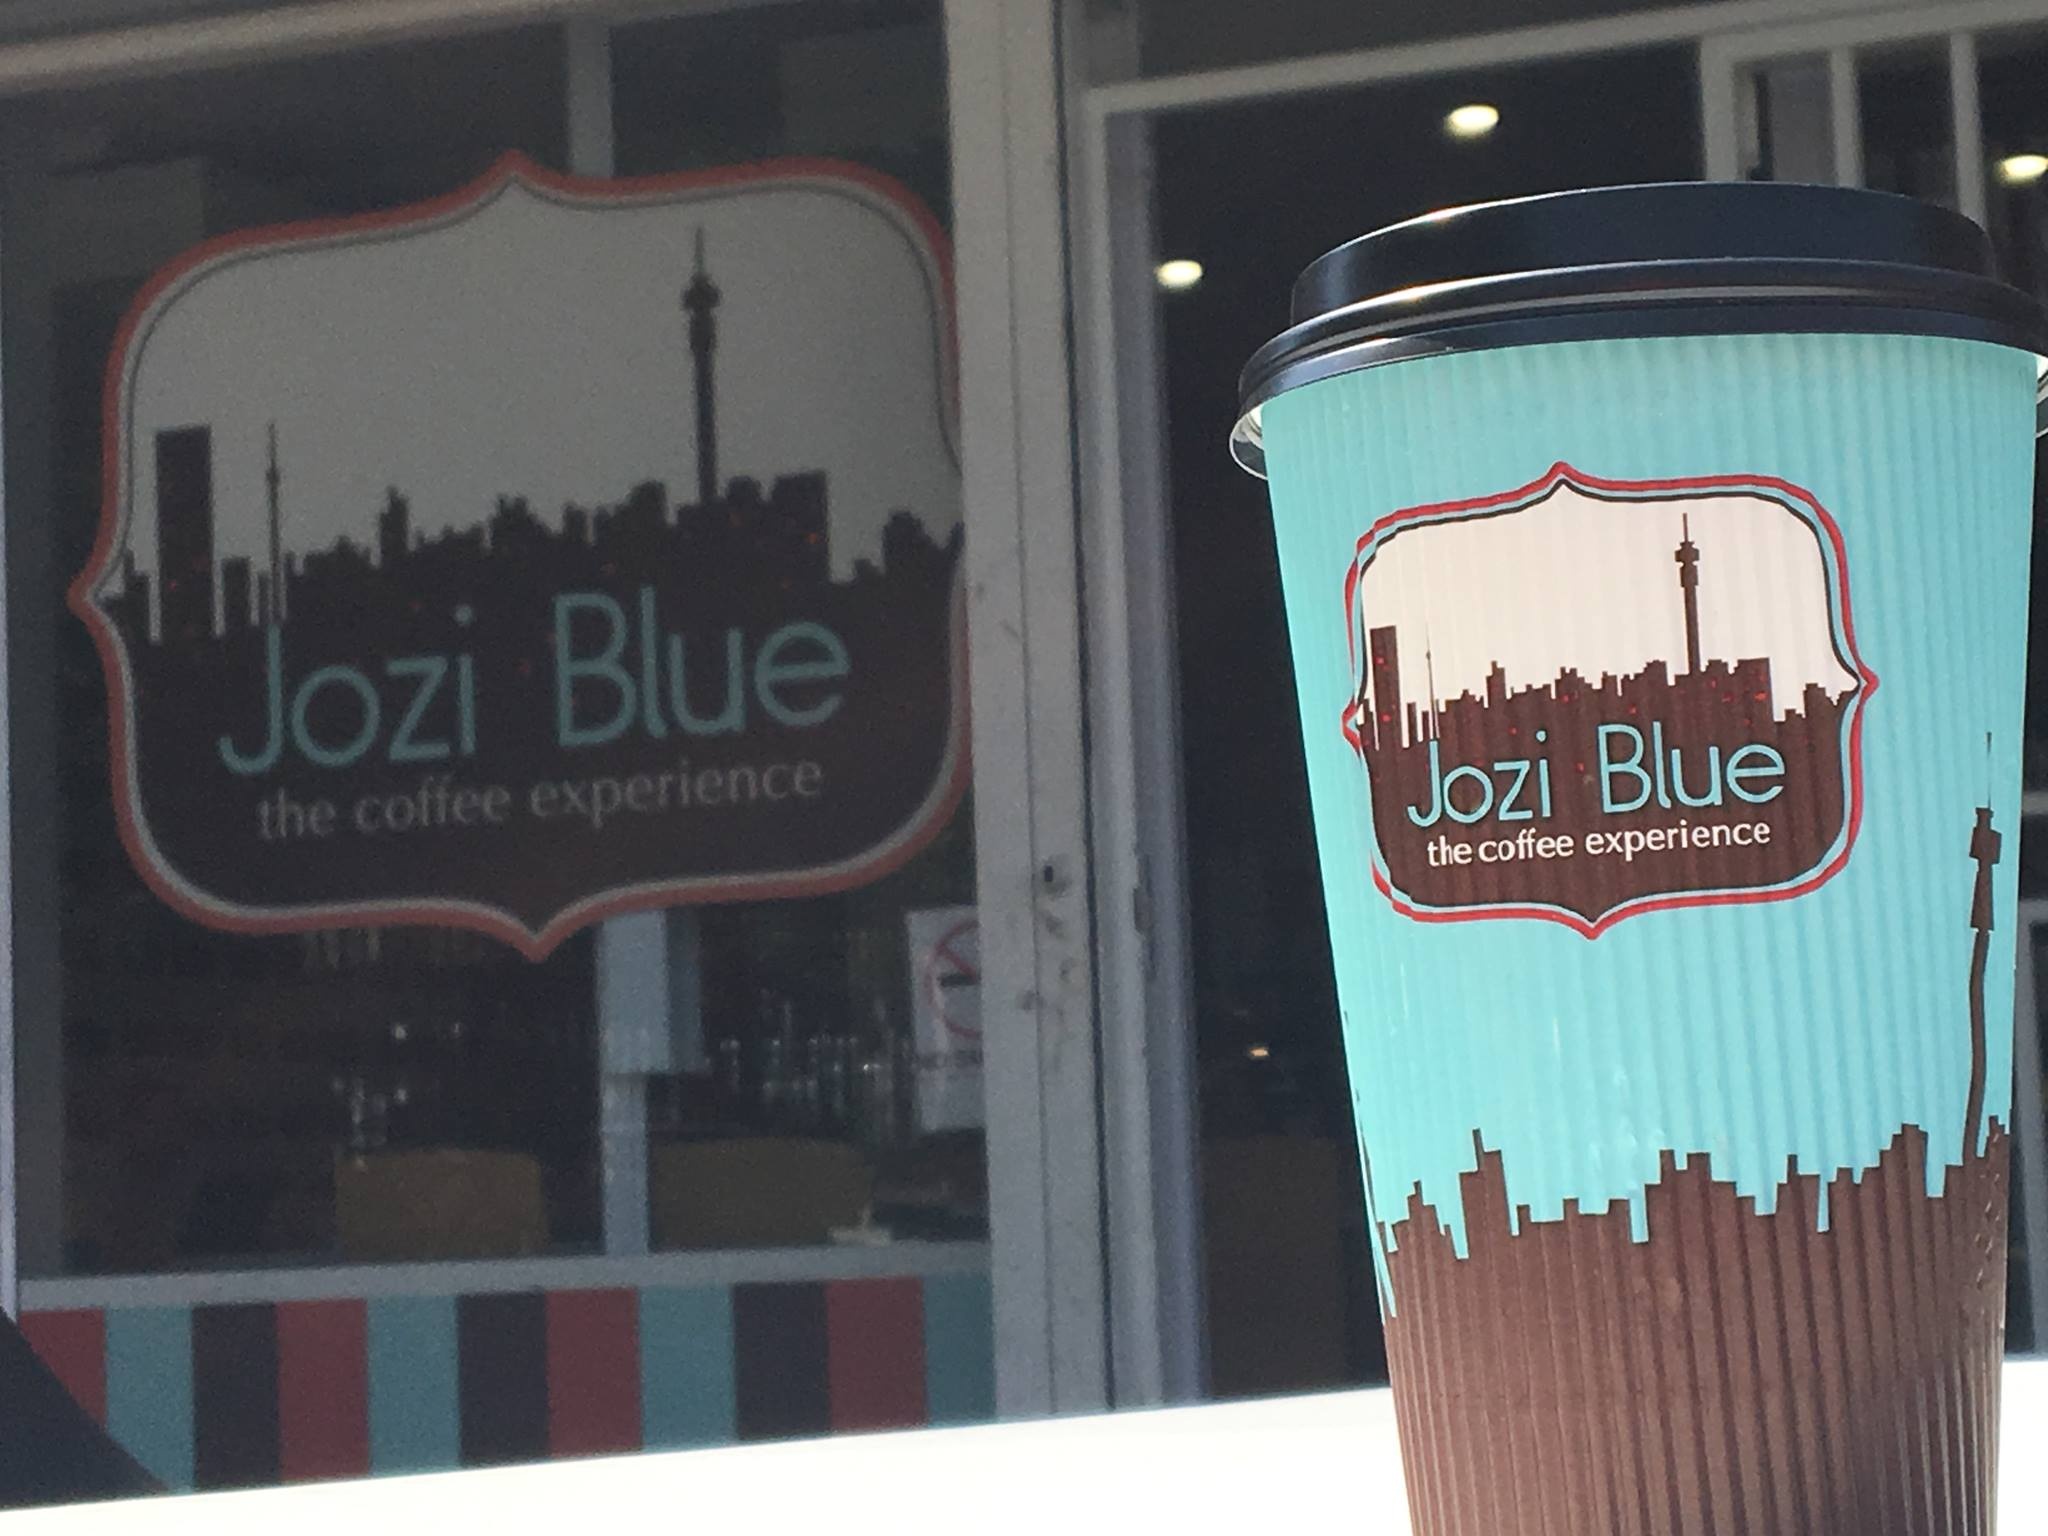 - Jozi Blue